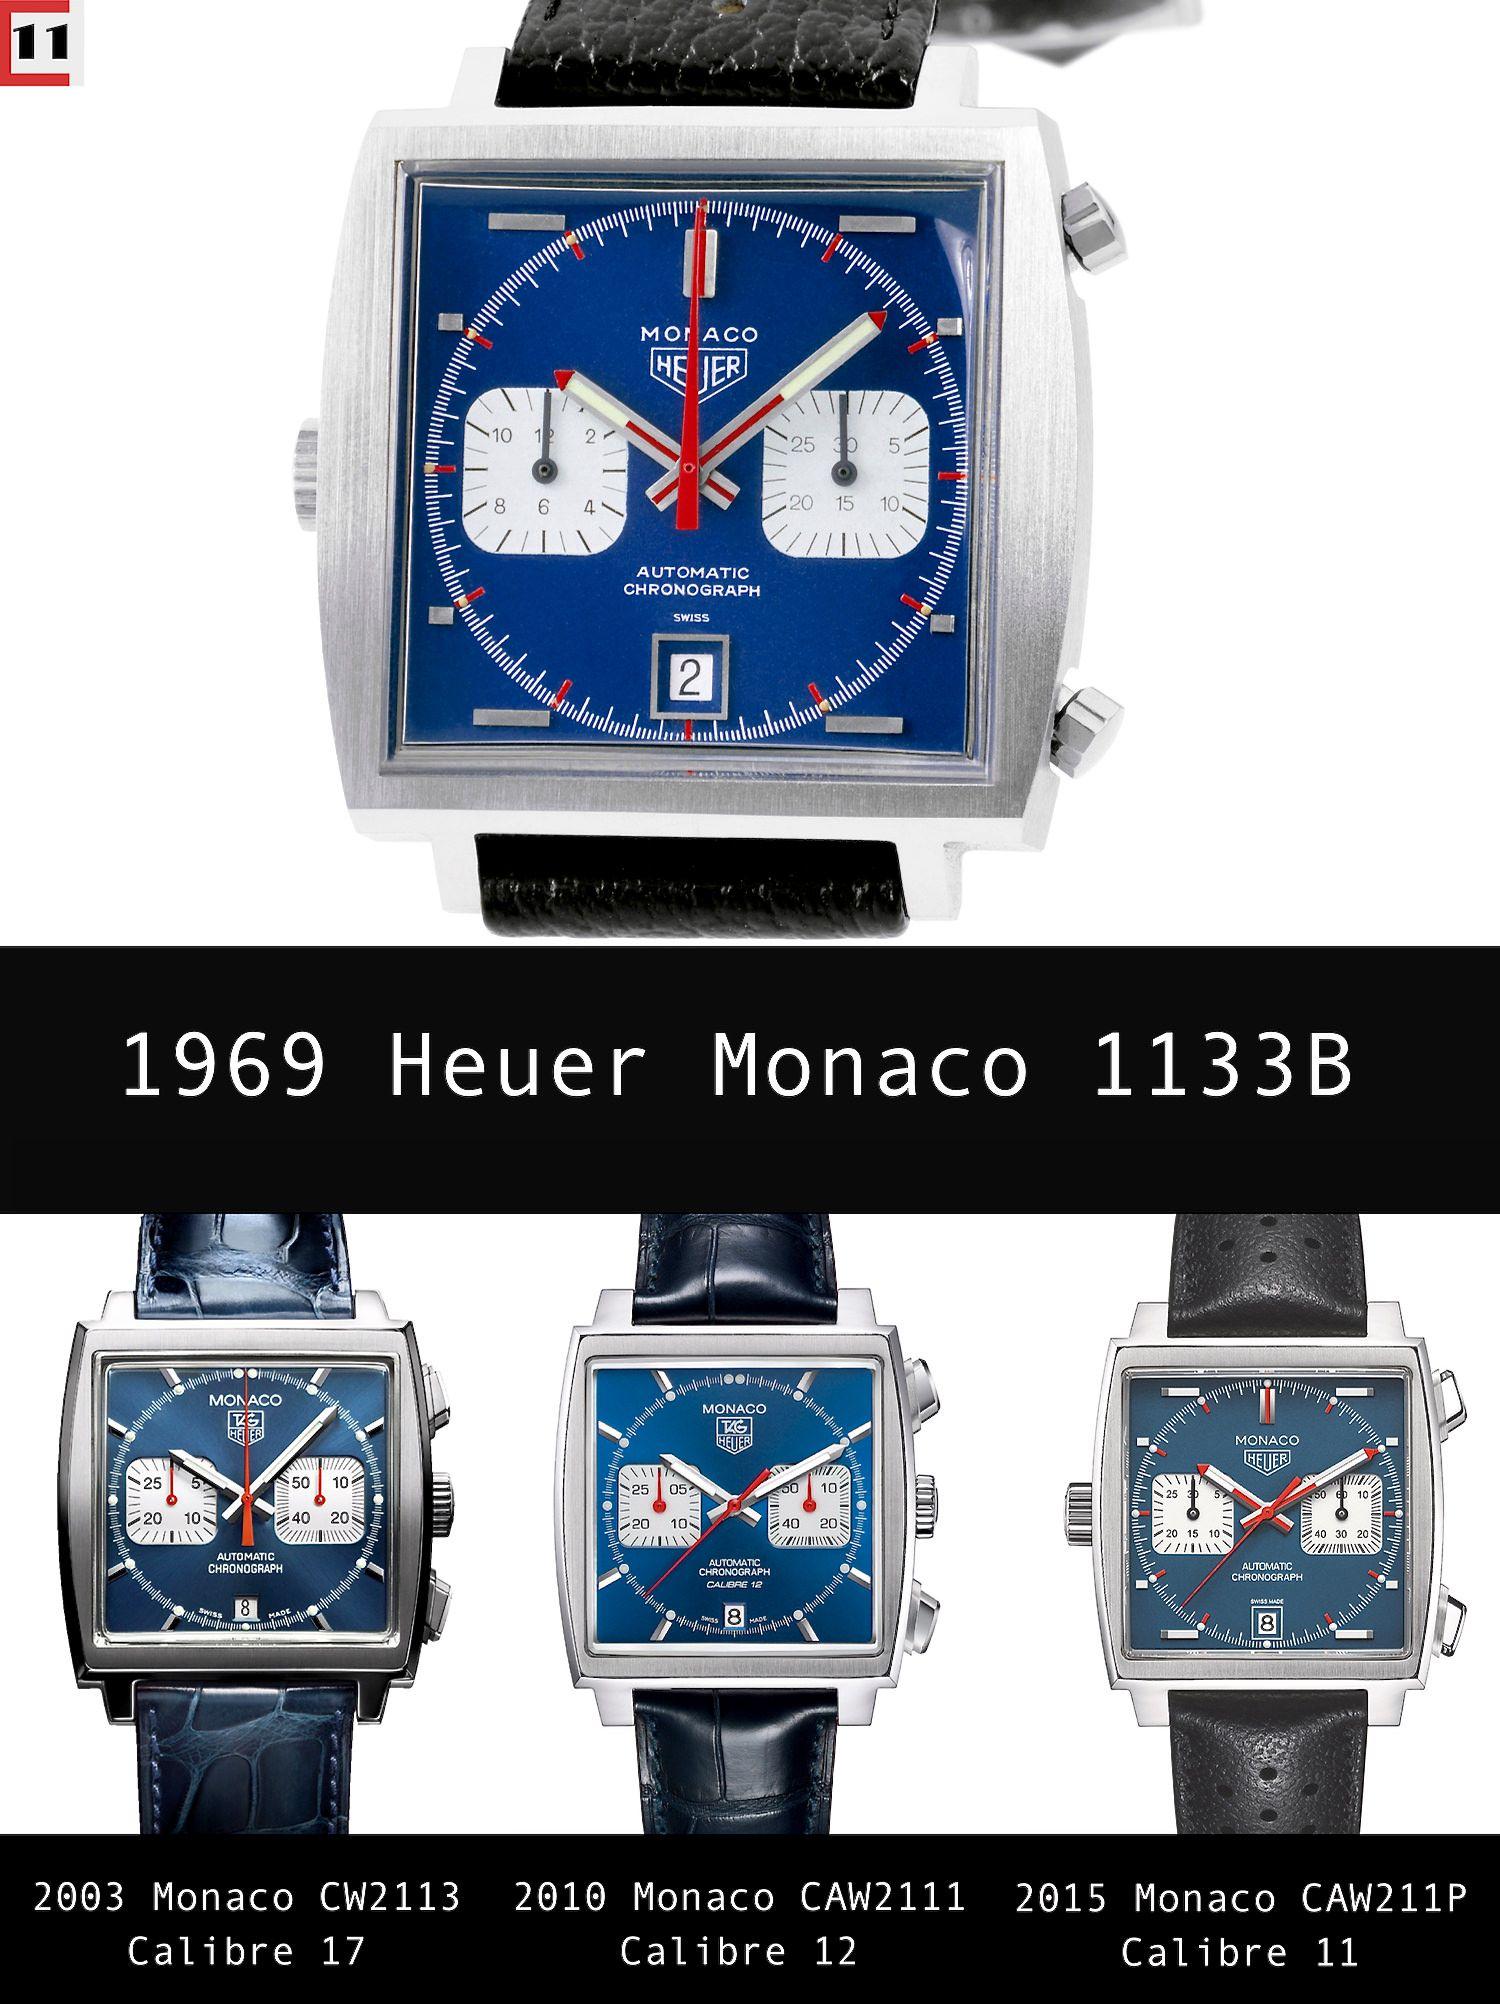 First Look  Heuer Monaco Calibre 11 McQueen Chronograph   The Home of TAG  Heuer Collectors 9ebbfda8732e